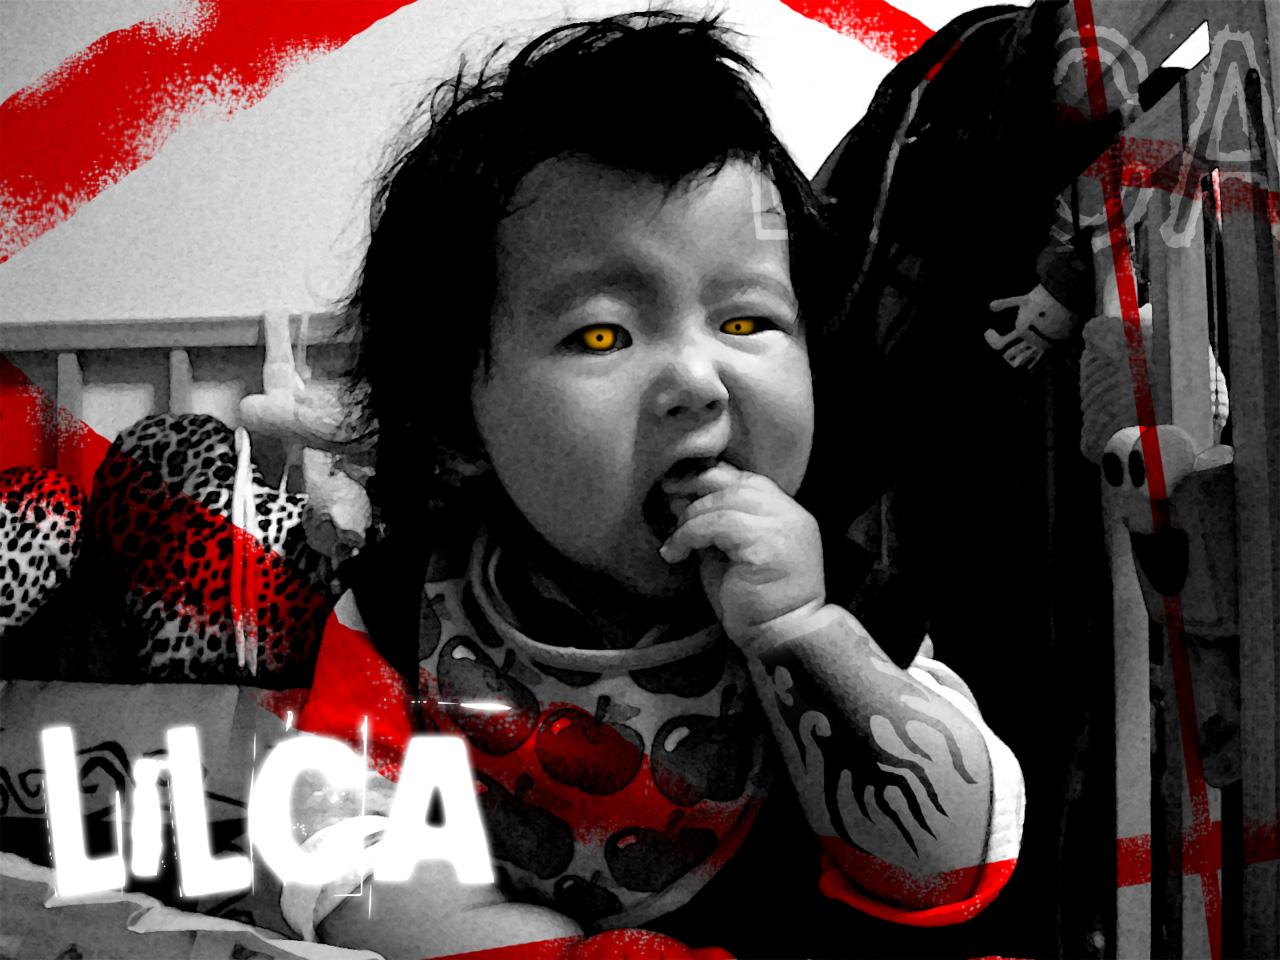 ROCK LiLCA